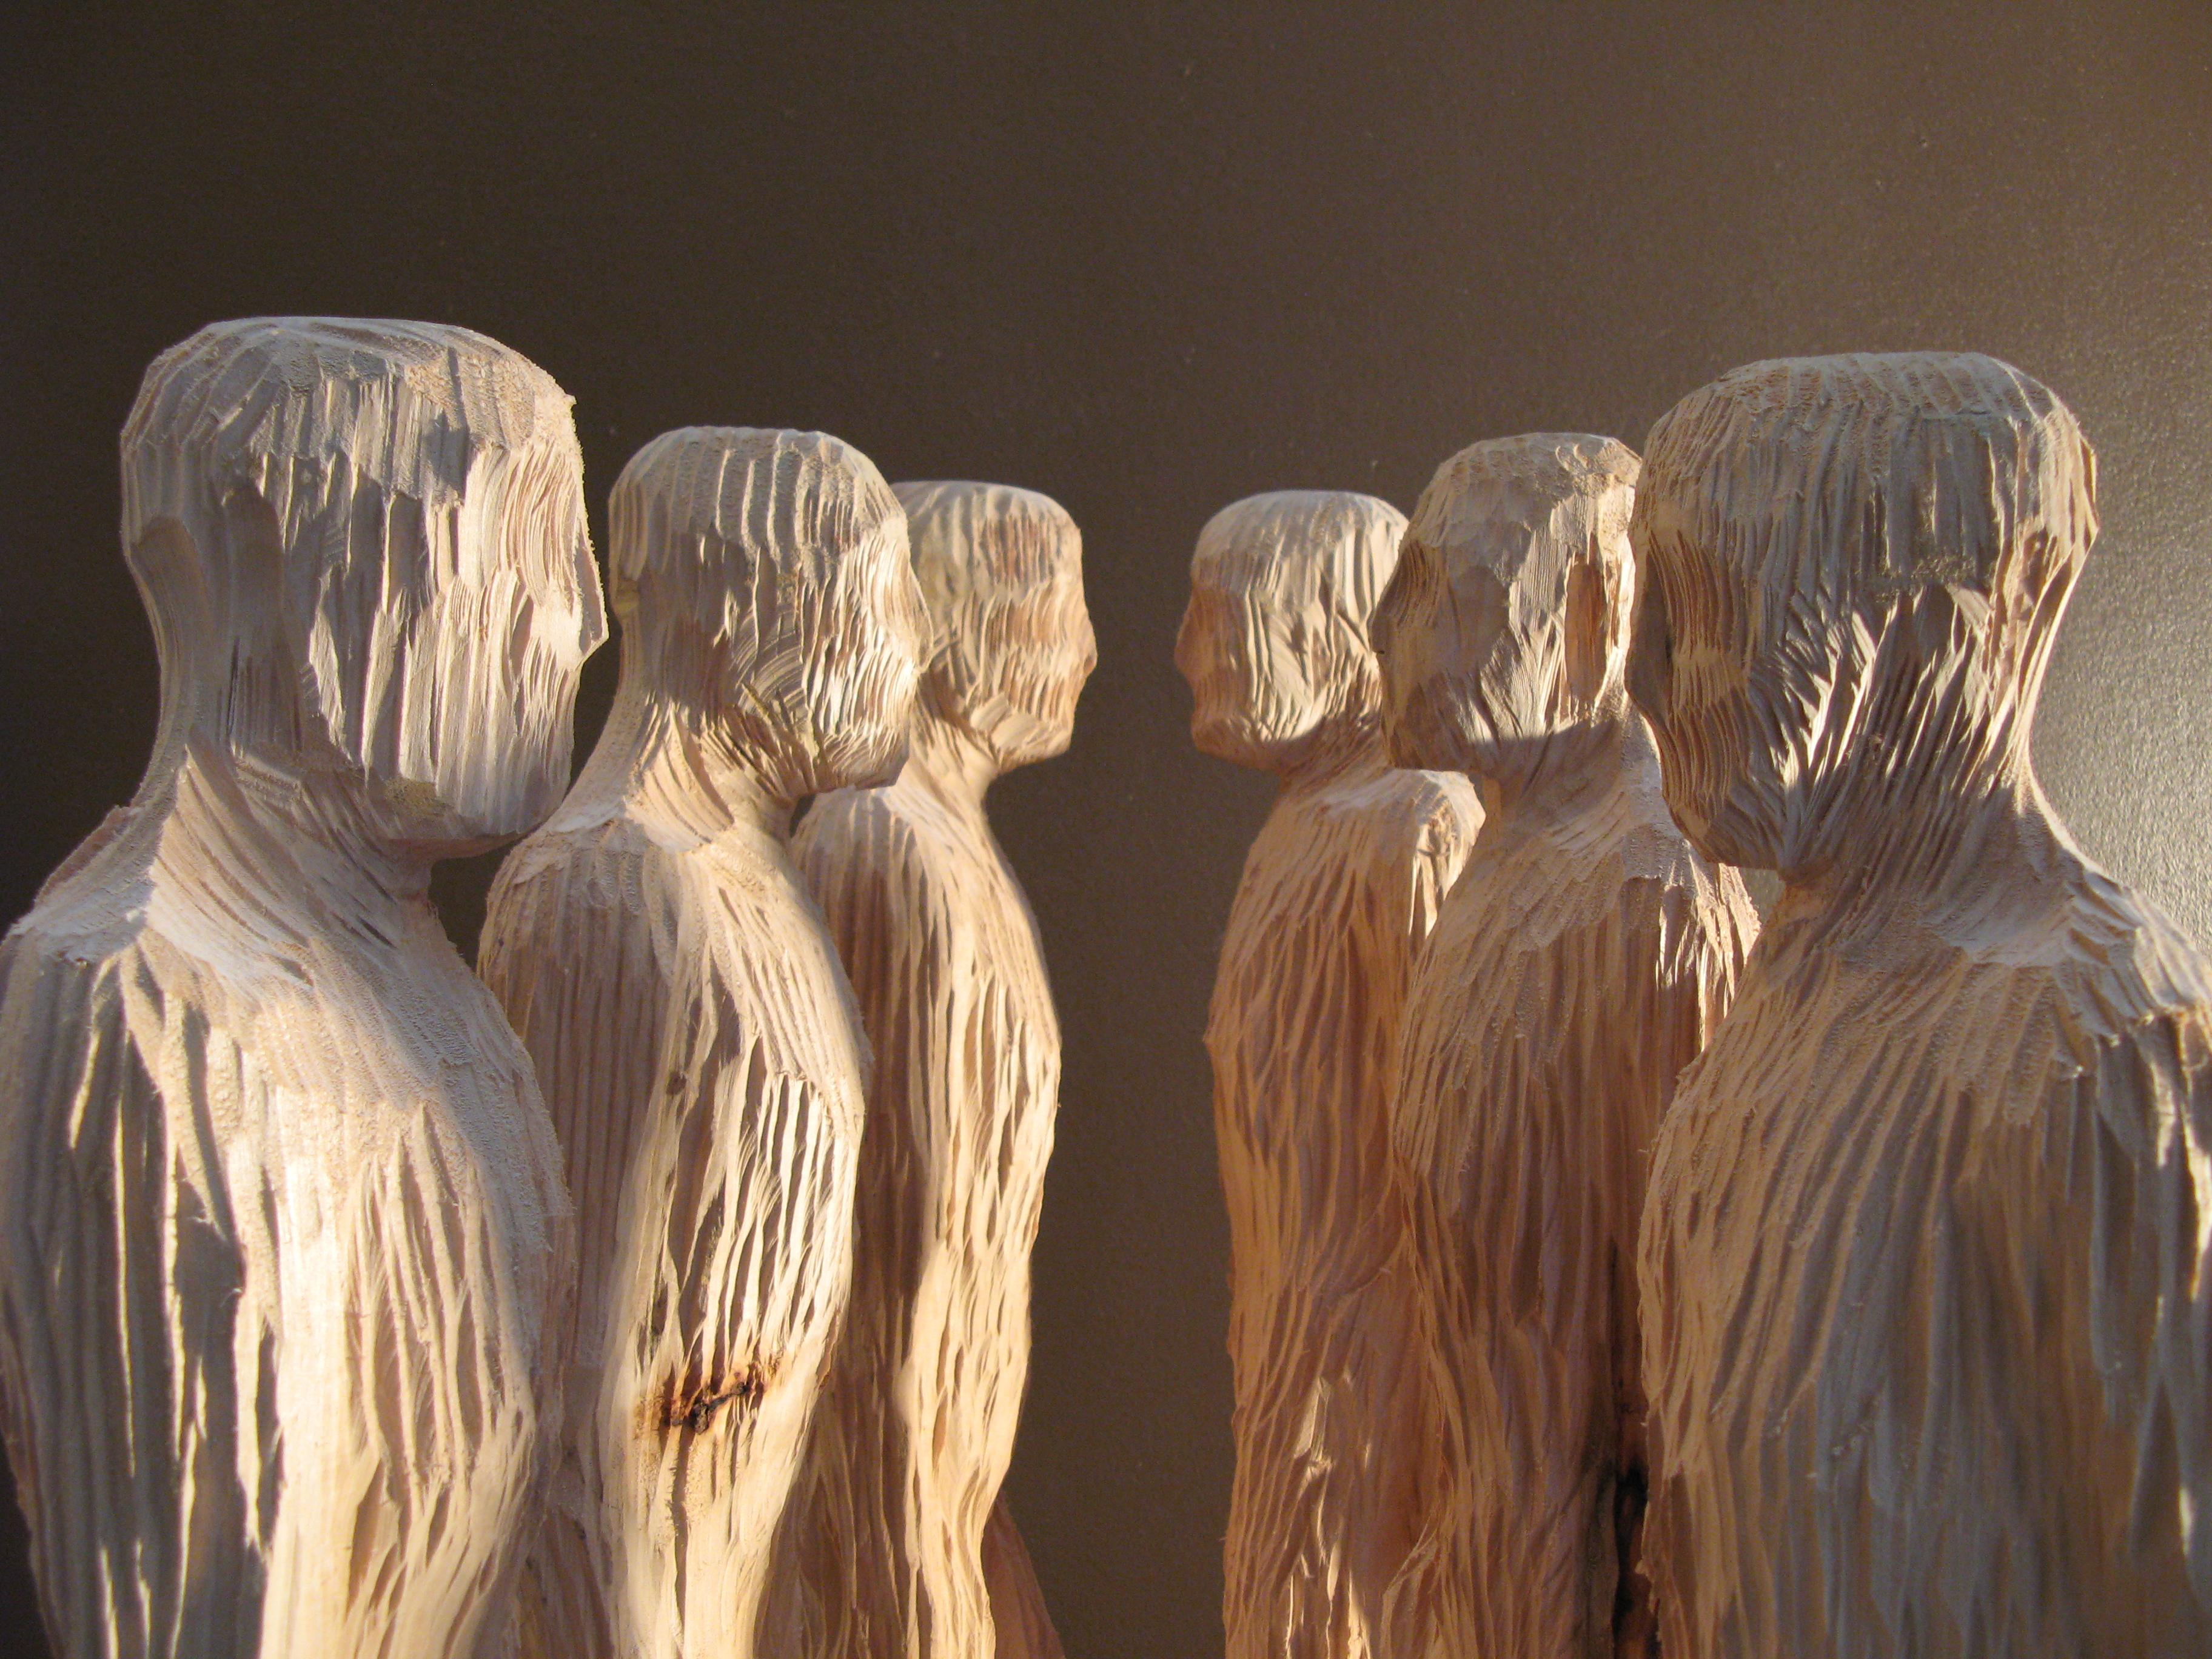 wooden attitudes 5